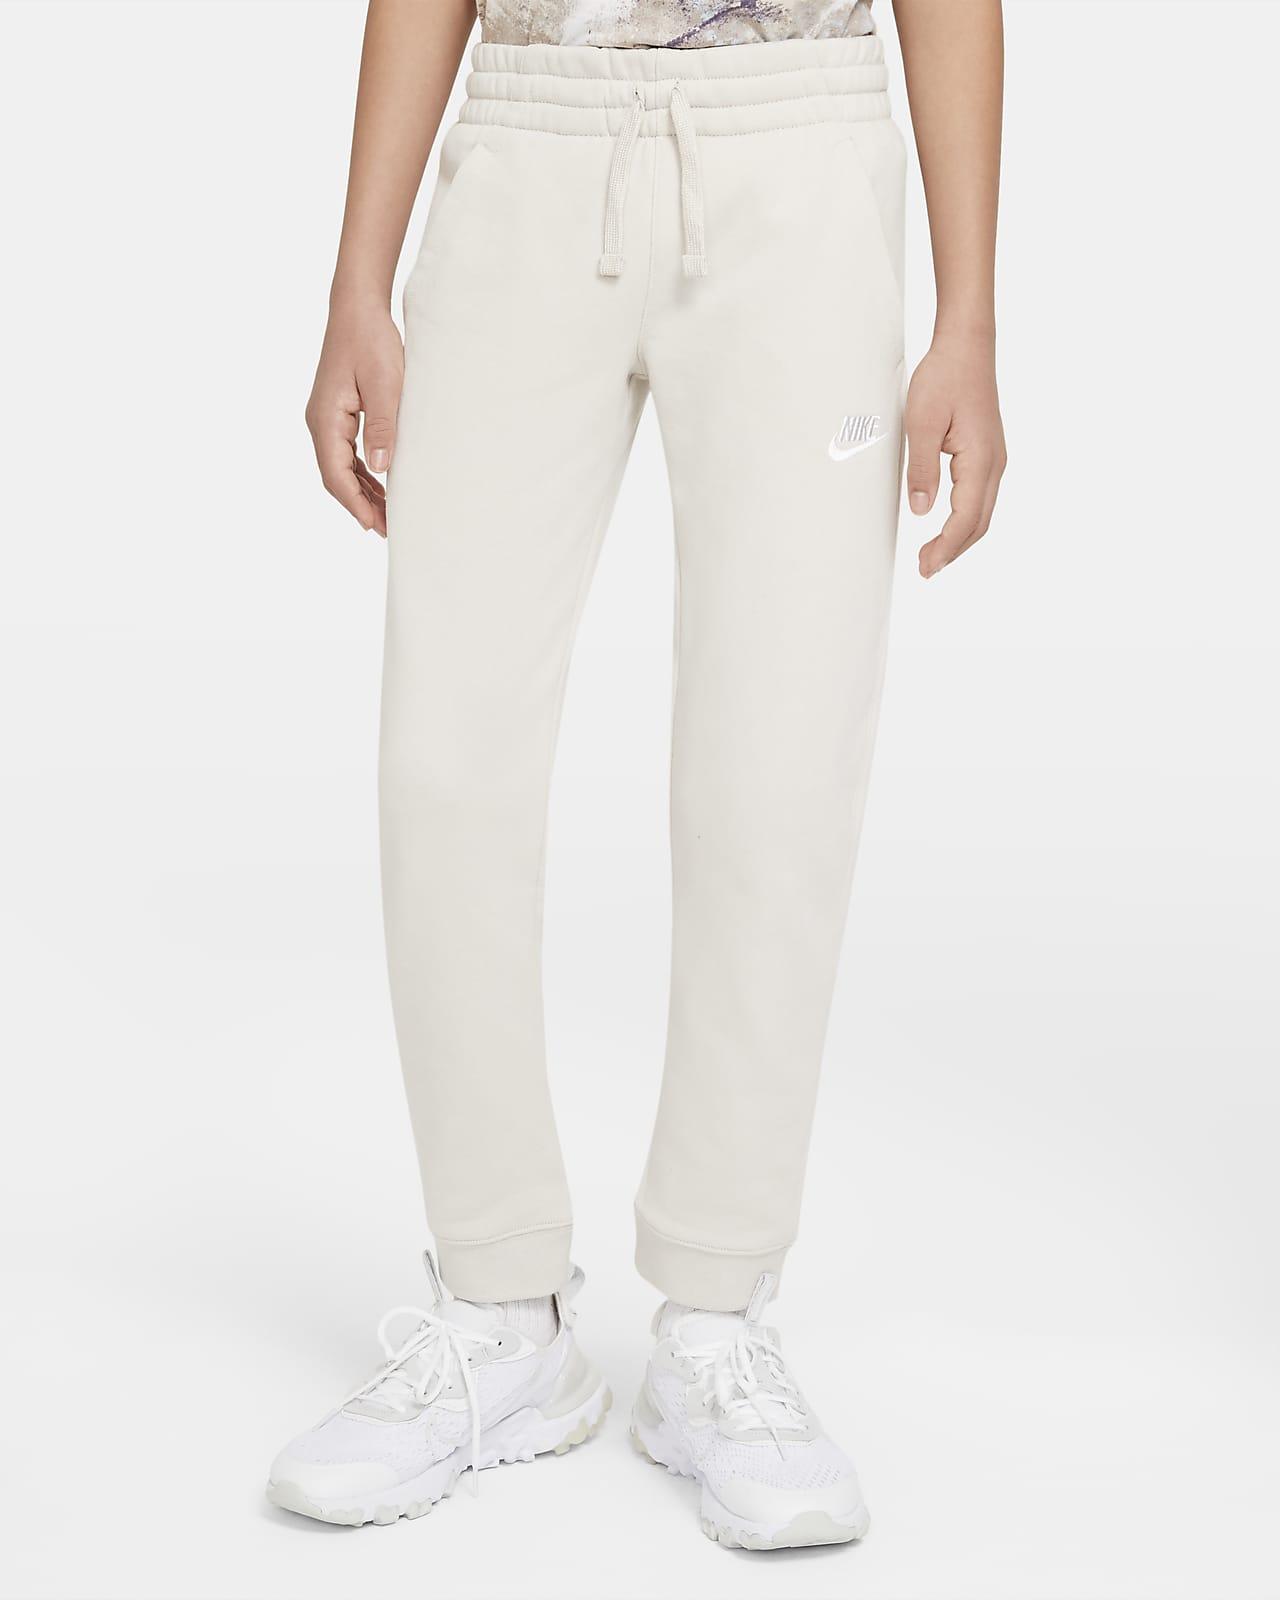 Nike Sportswear Club Older Kids' (Boys') French Terry Trousers